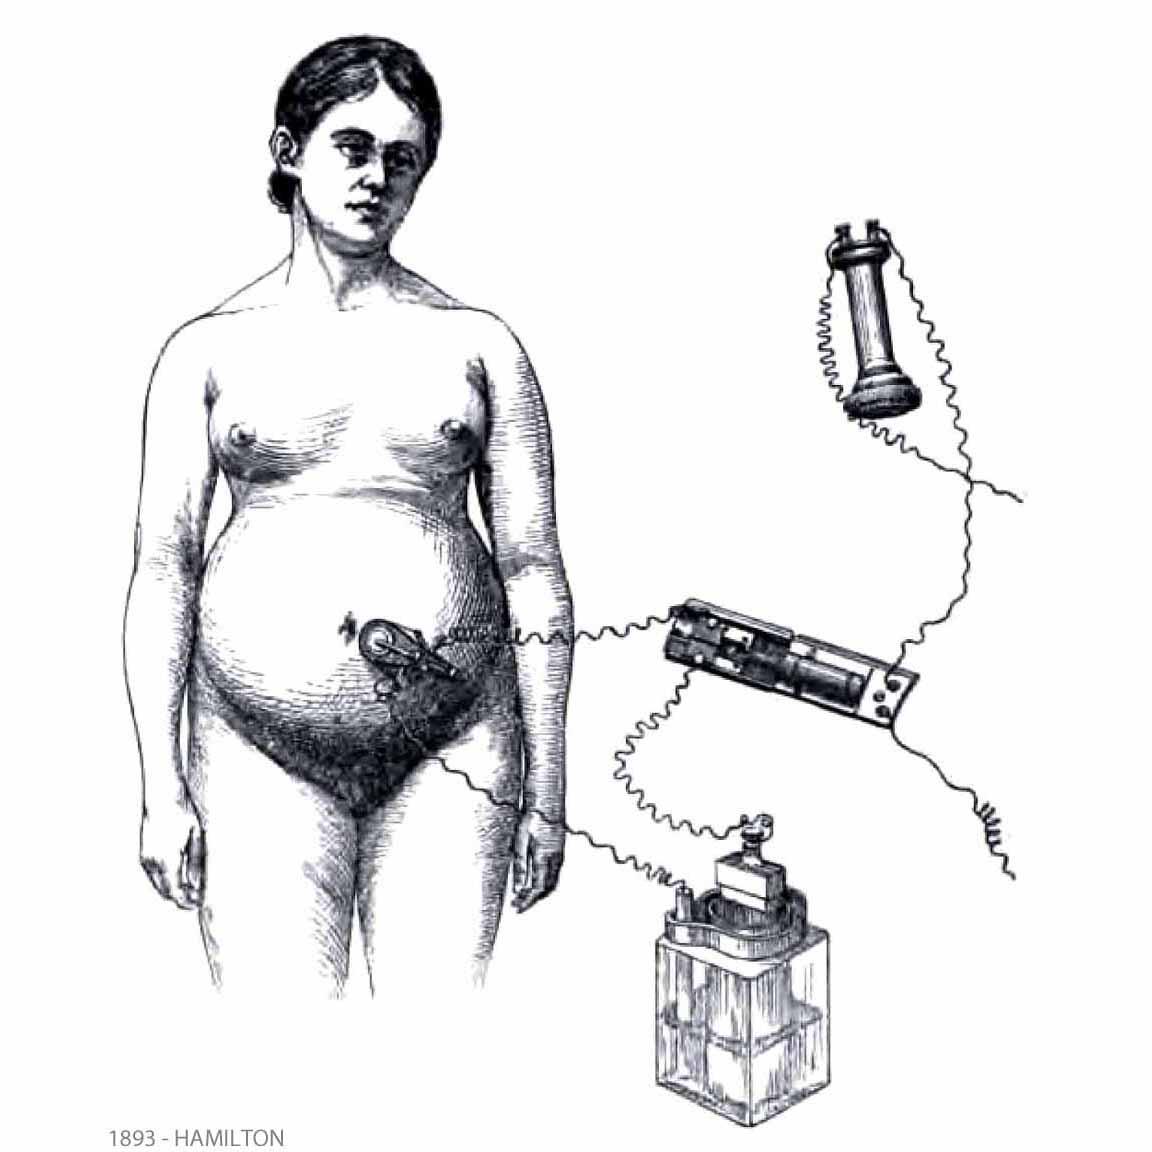 1893-HAMILTON-FHR auscultation with microphone